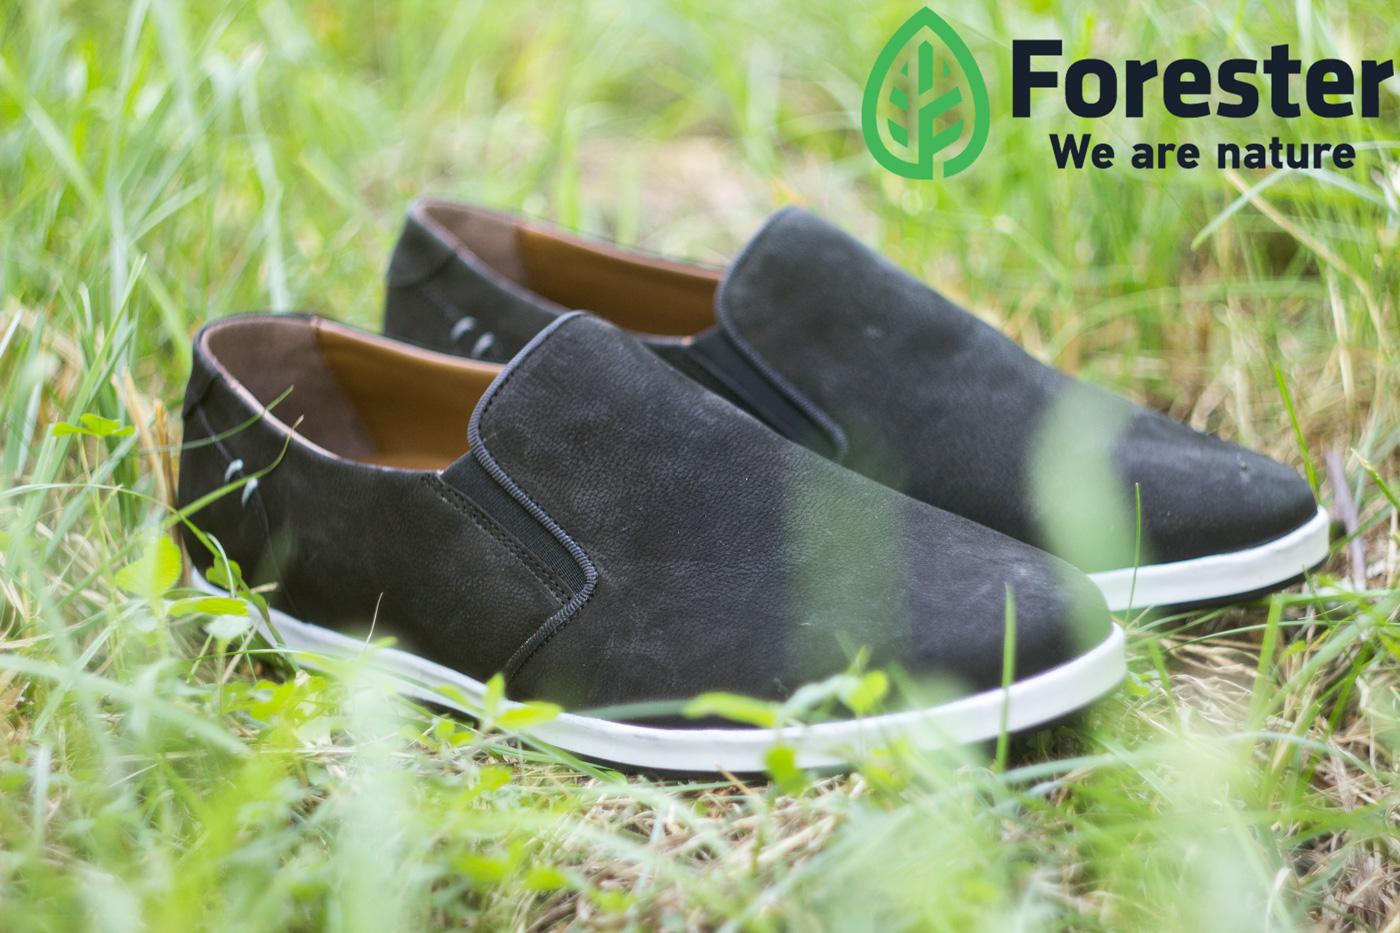 Коллекция комфортной обуви Forester